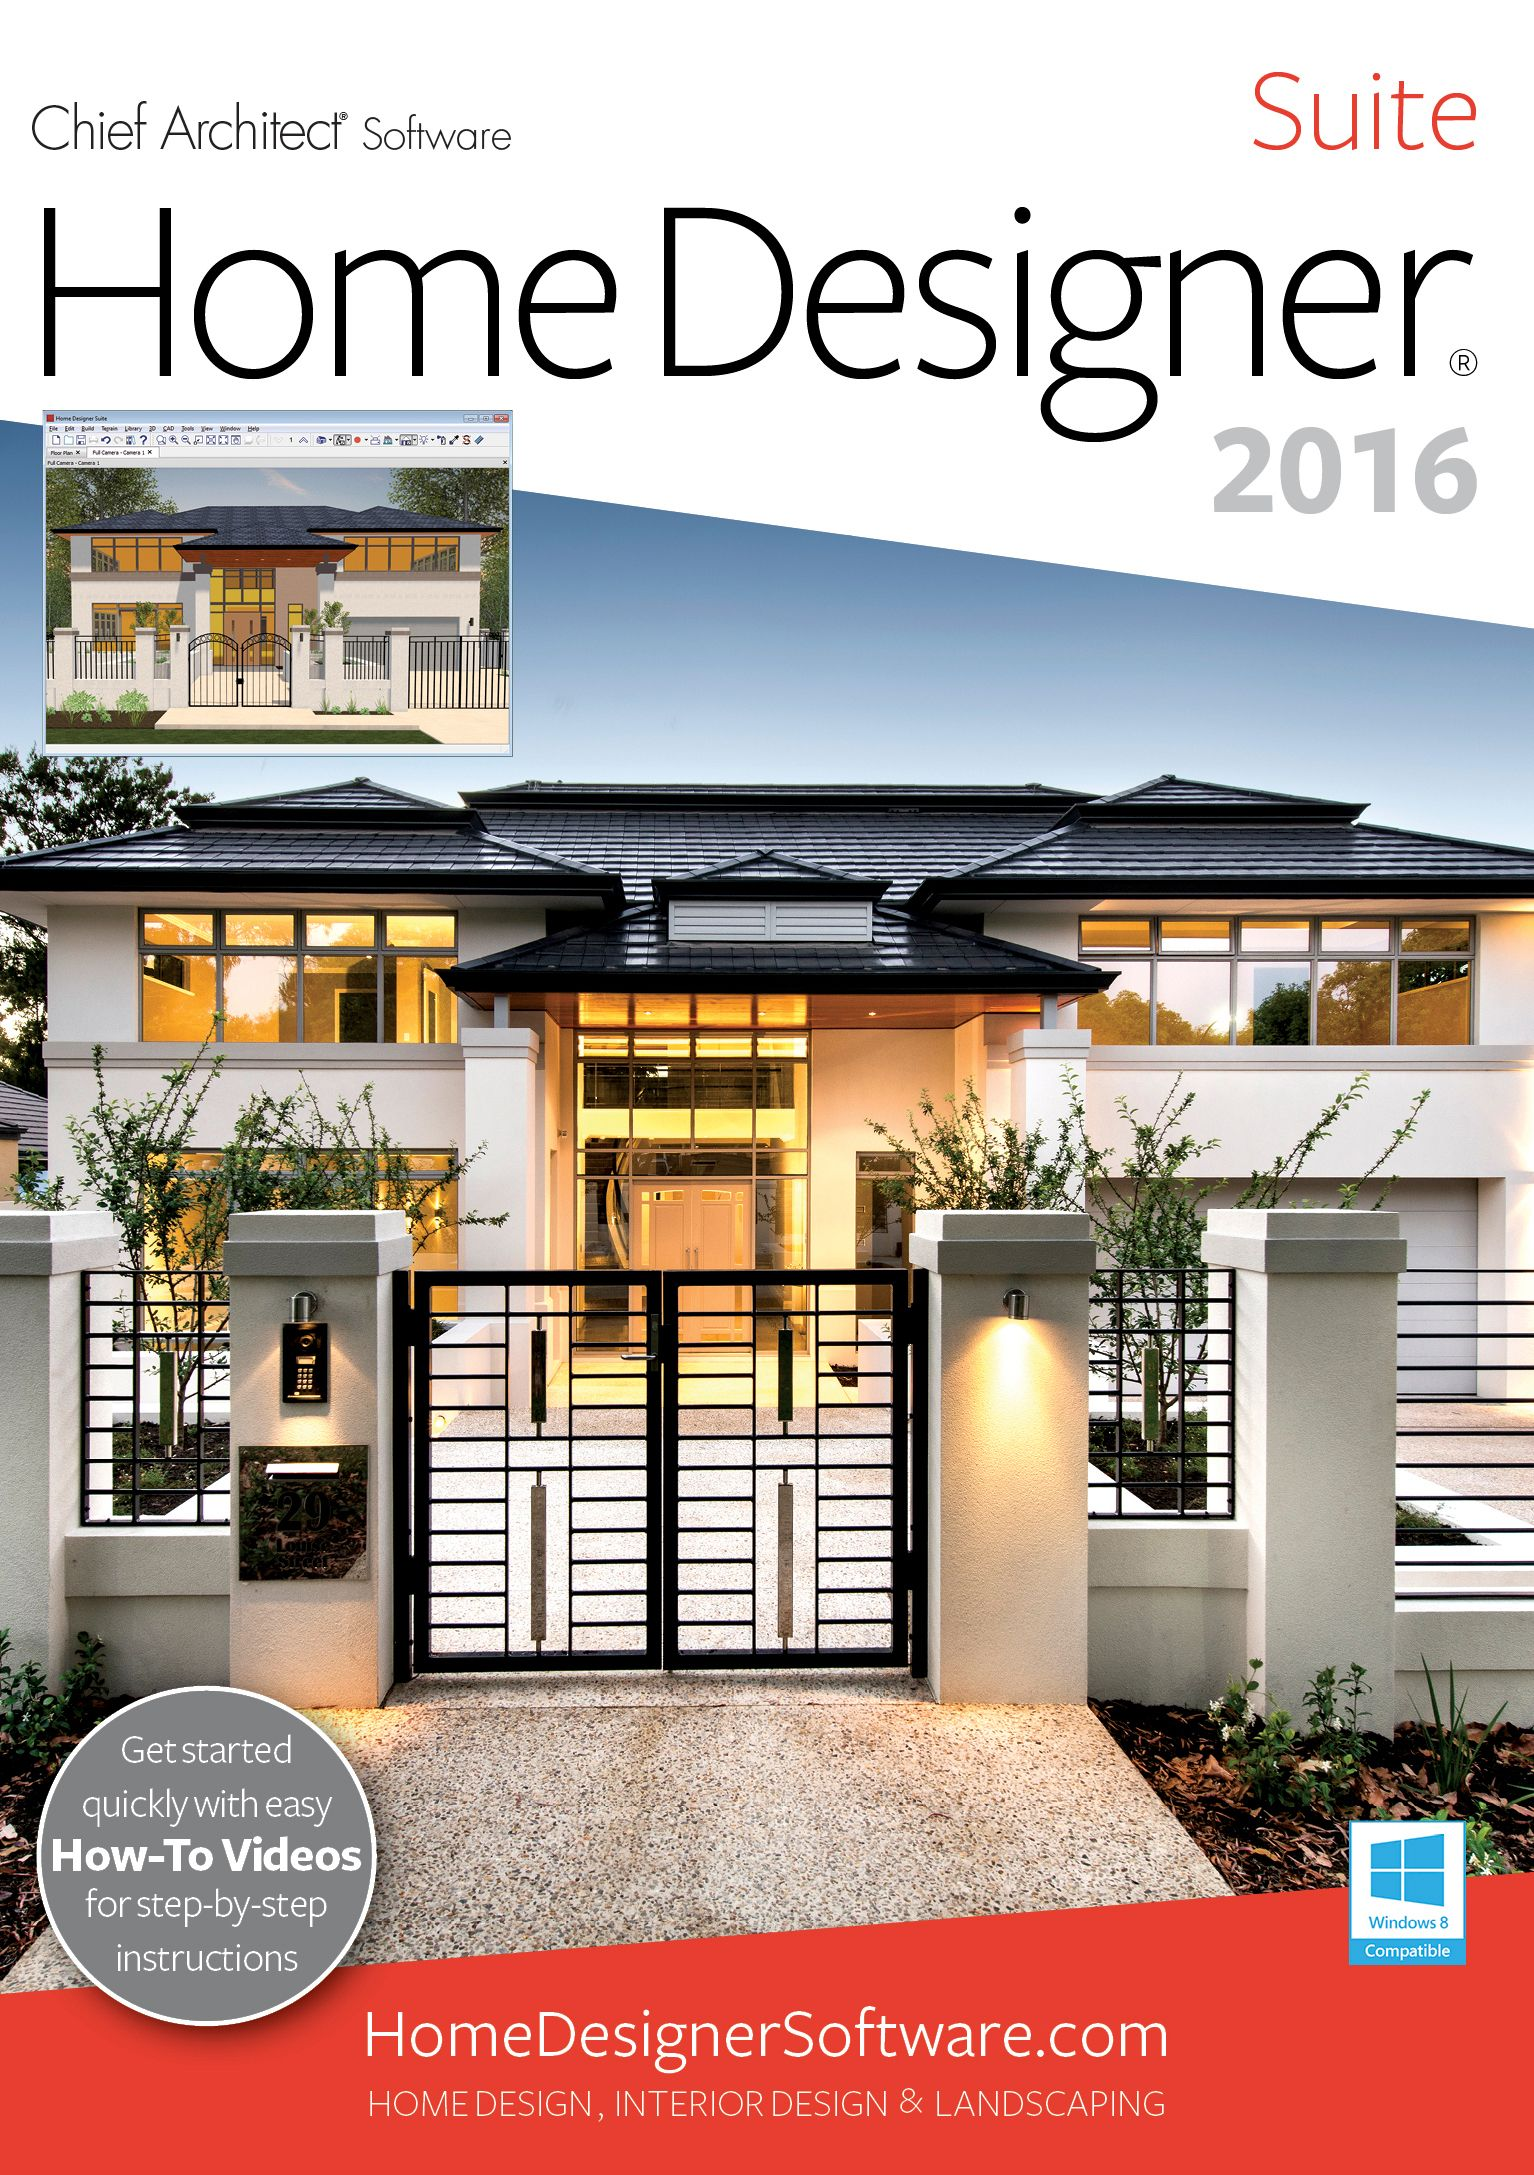 Robot Check Home Designer Suite Home Design Programs Home Design Software